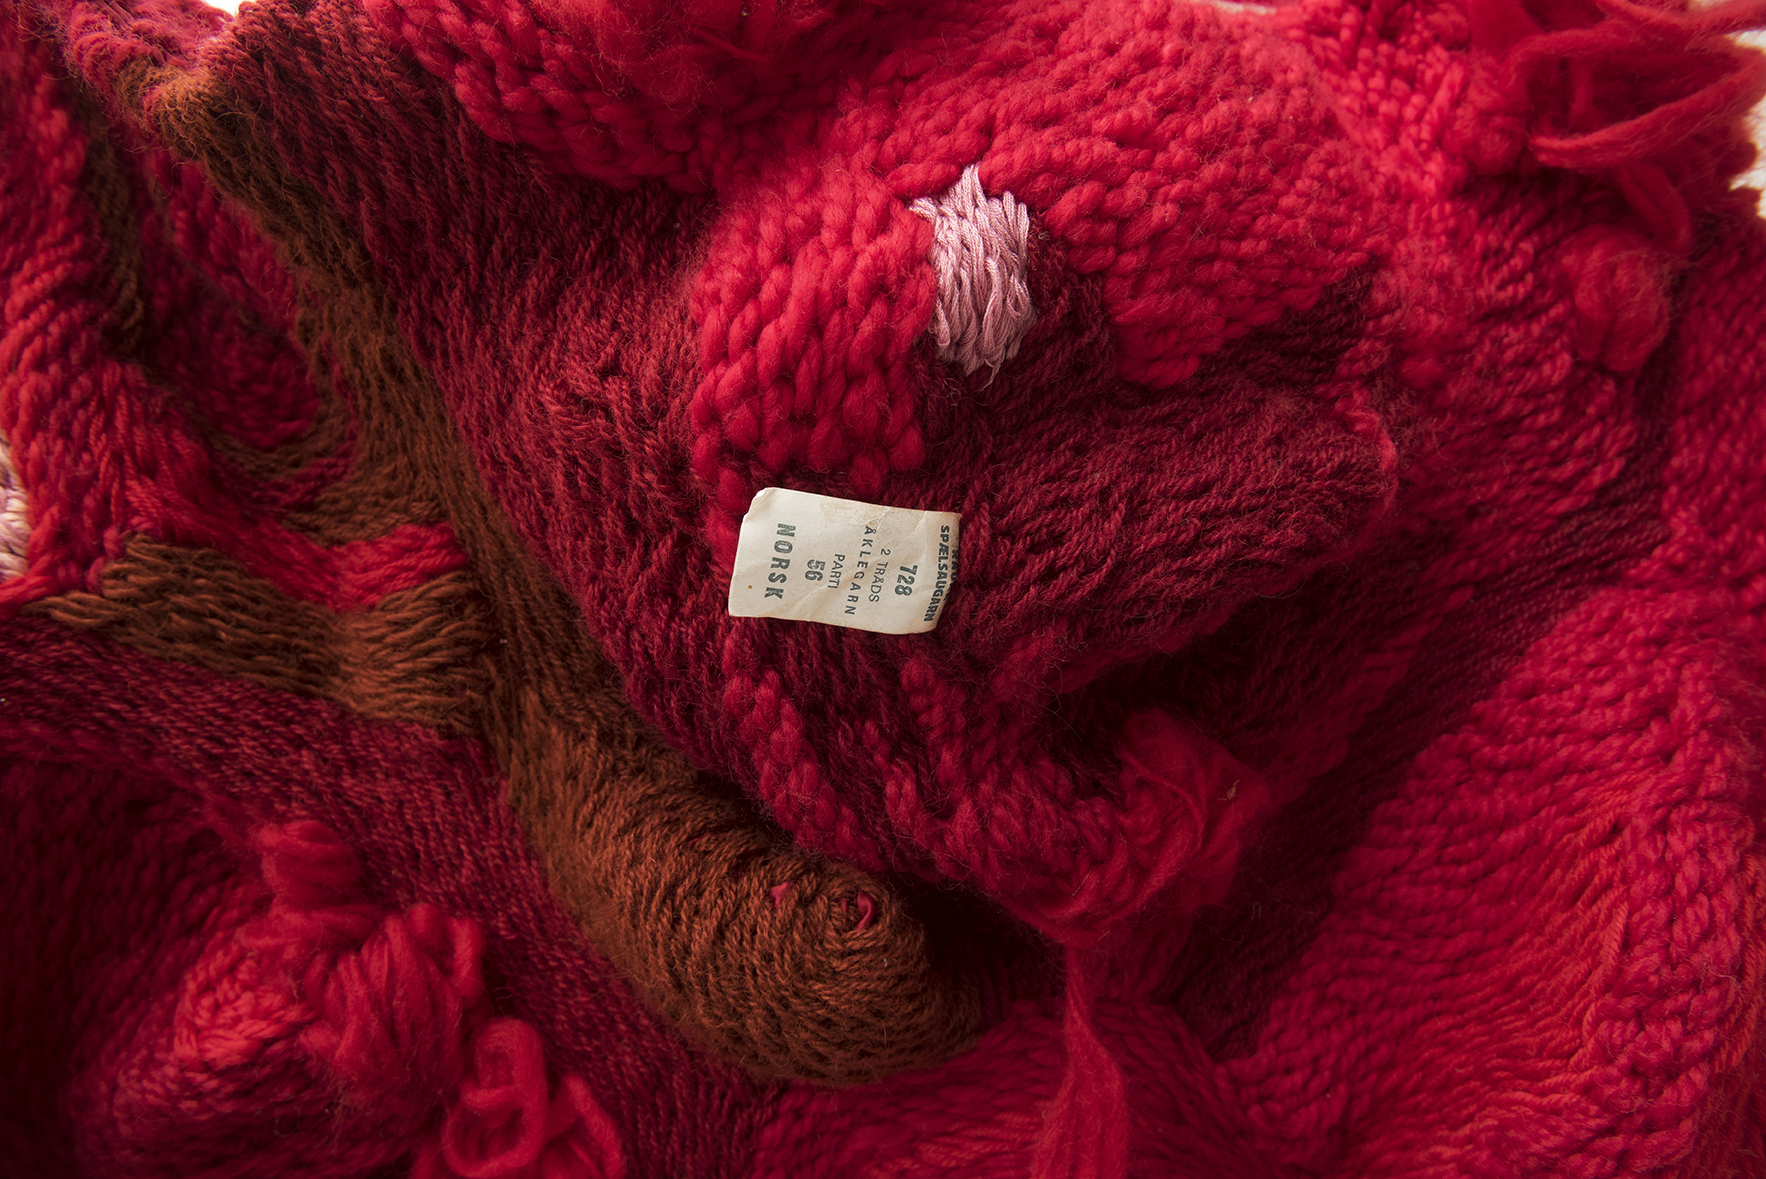 Lineage II (2016 - 17) Stem Stitch on polyester  Photo: Jan Inge Haga